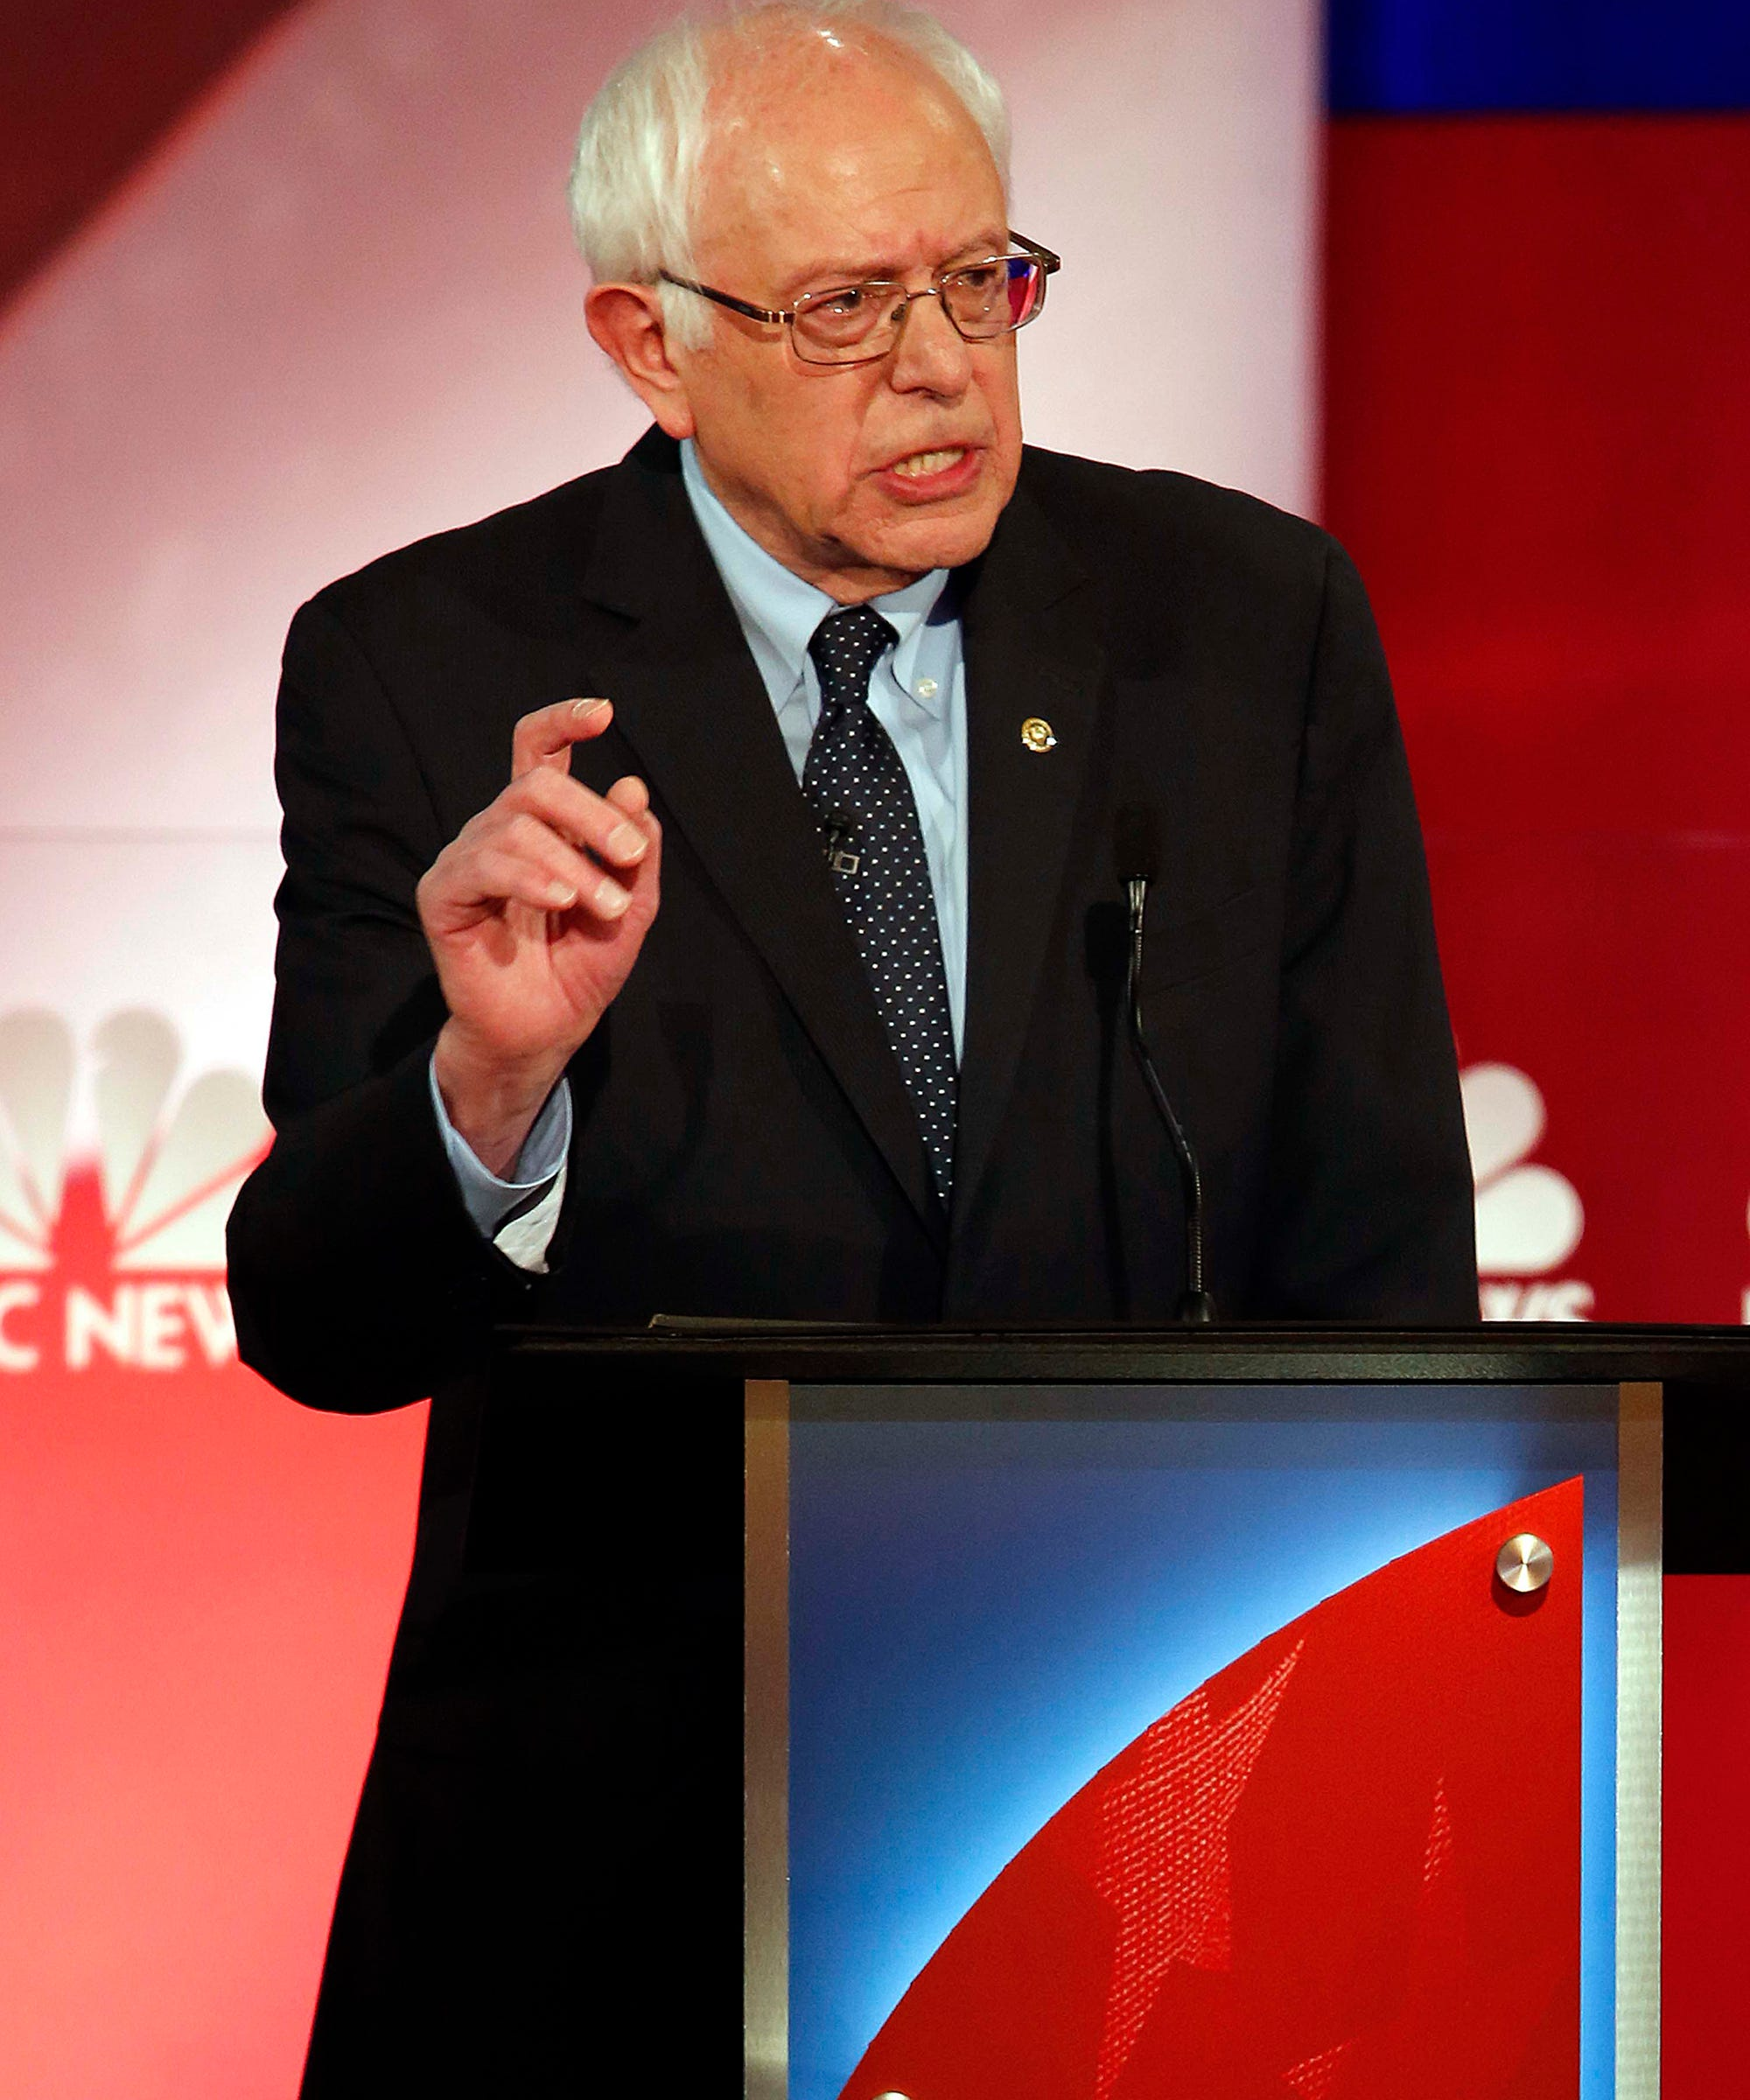 Heroin Takes Center Stage At Democratic Debate